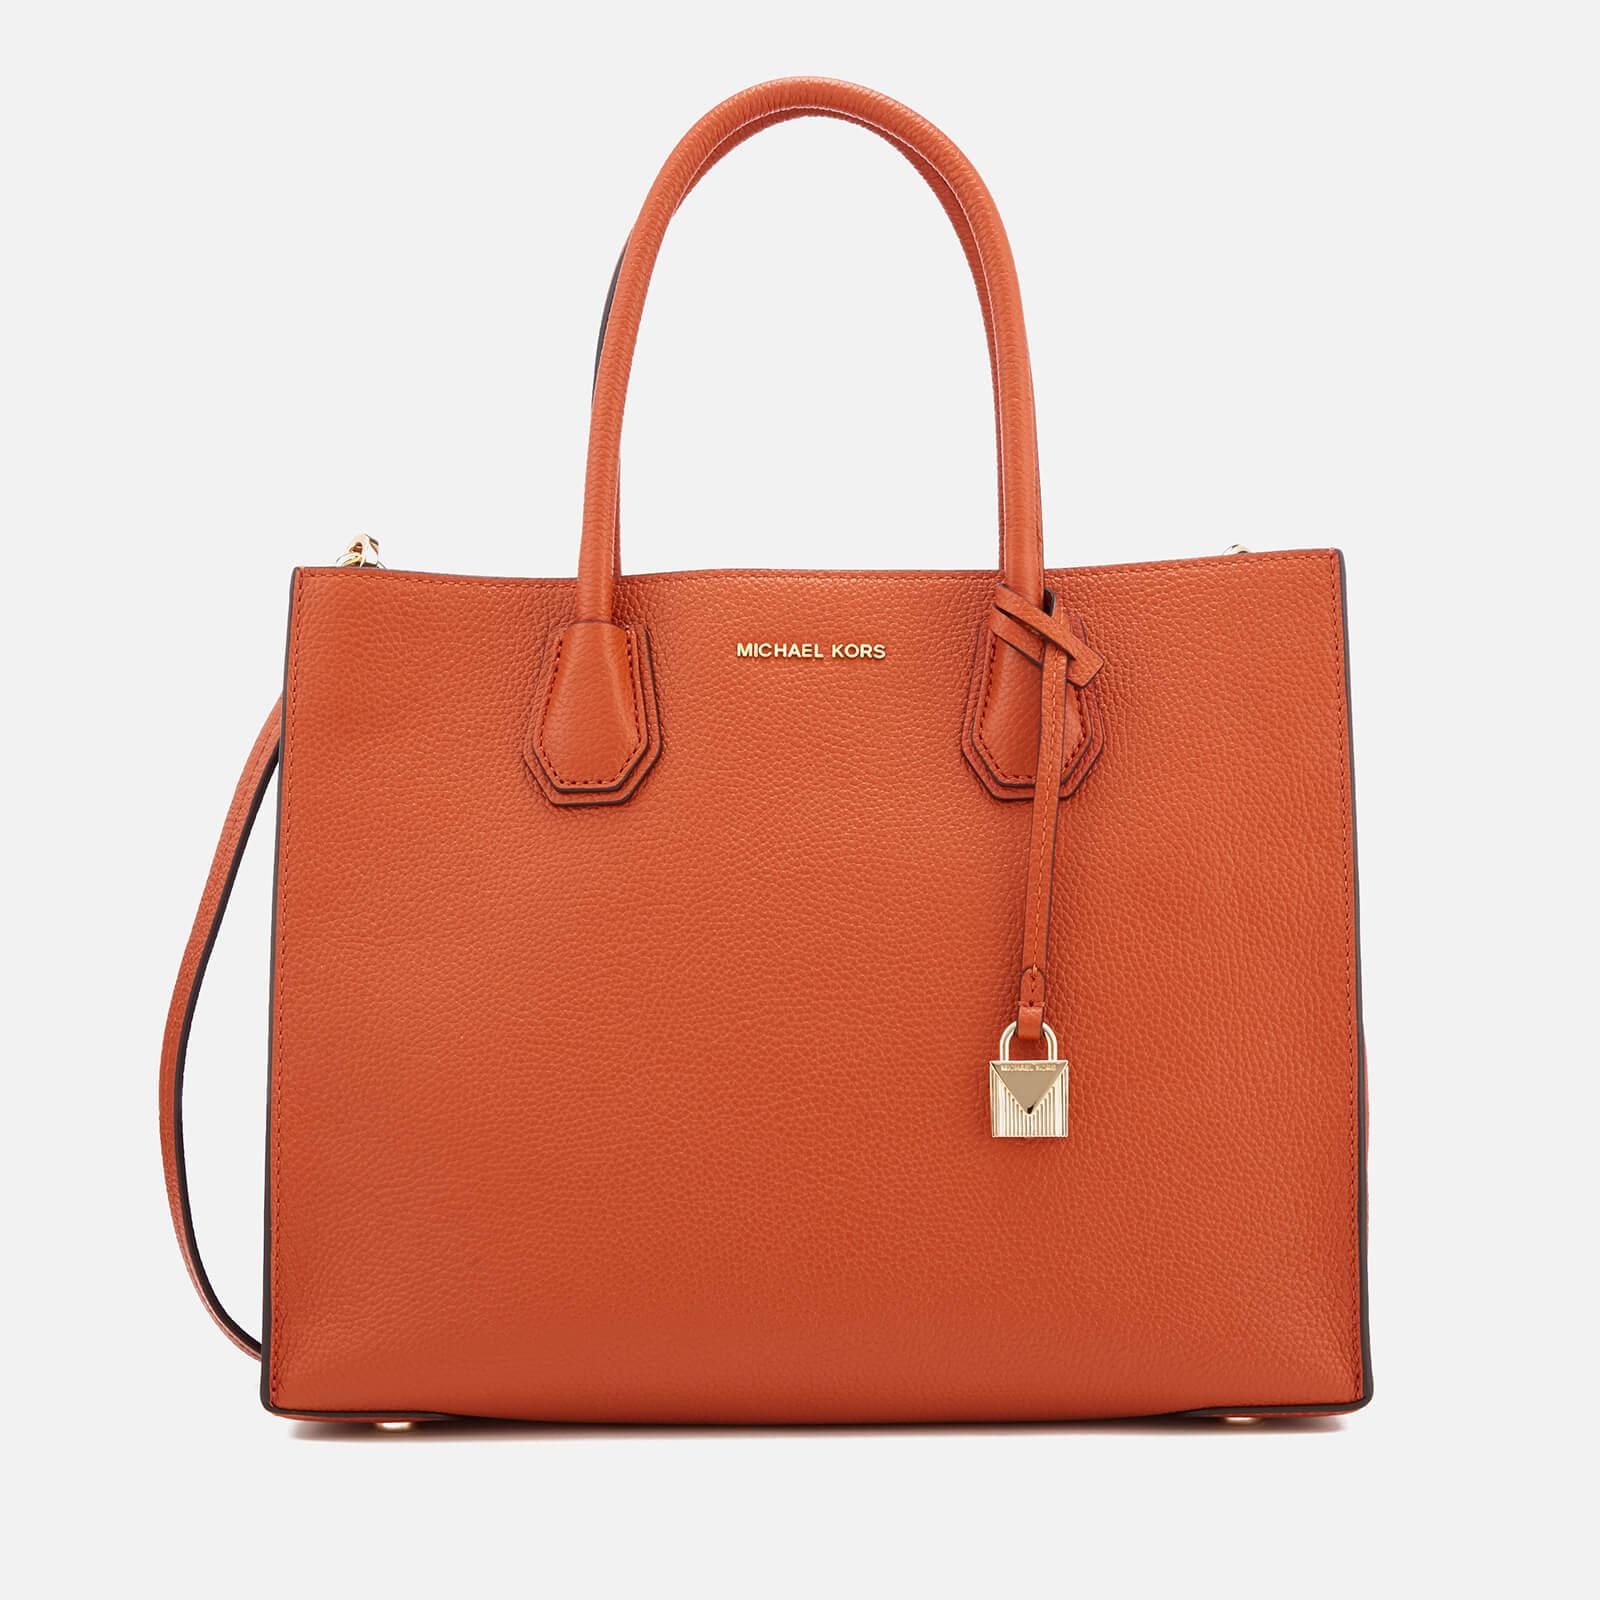 029a2b4f1 MICHAEL MICHAEL KORS Women's Mercer Large Tote Bag - Orange